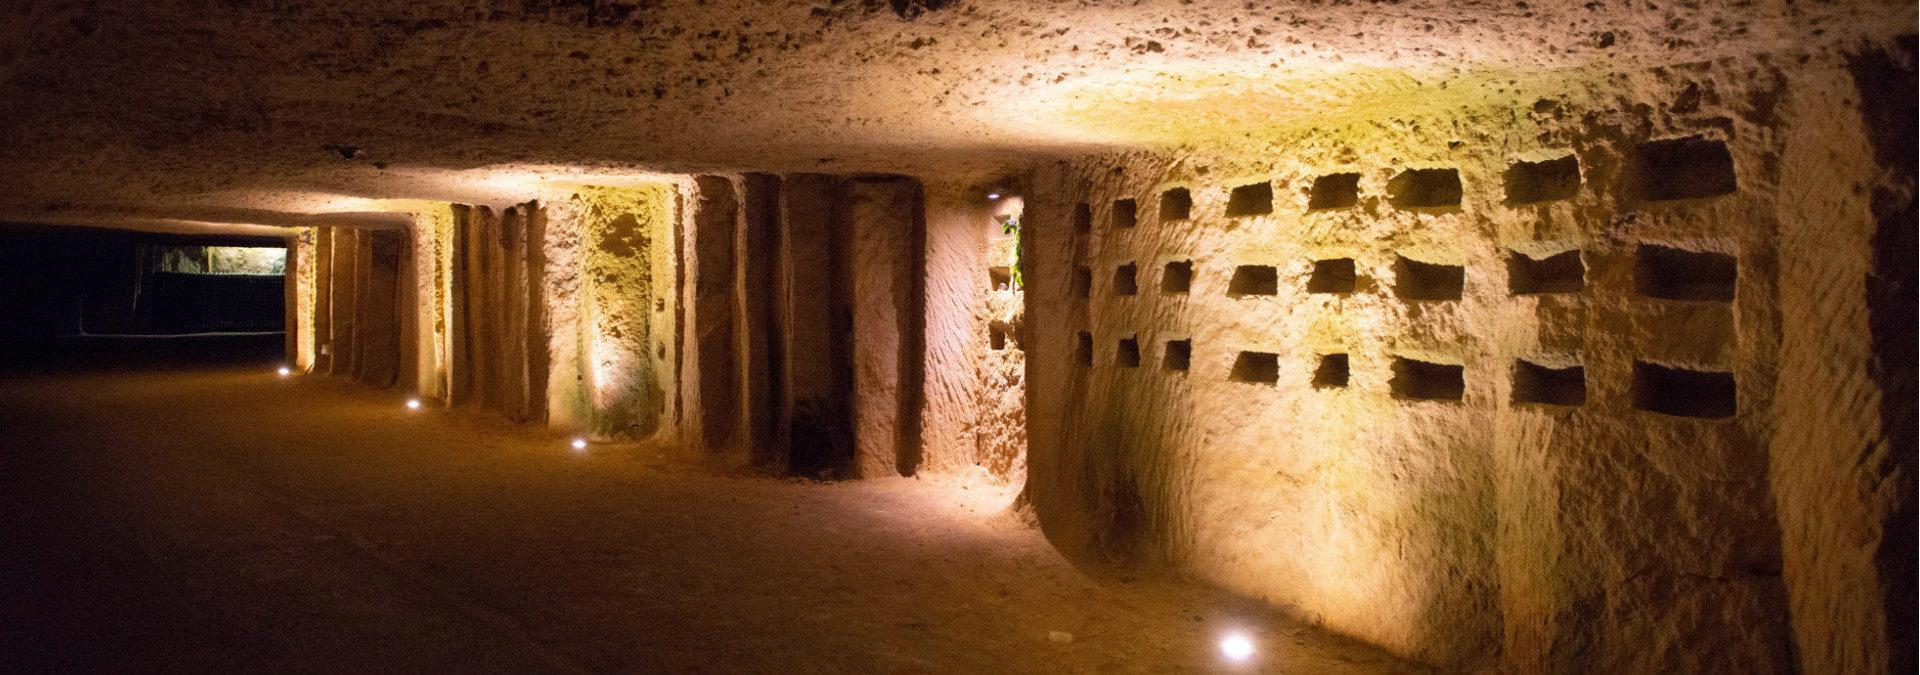 Blanc Foussy- Grandes caves saint roch